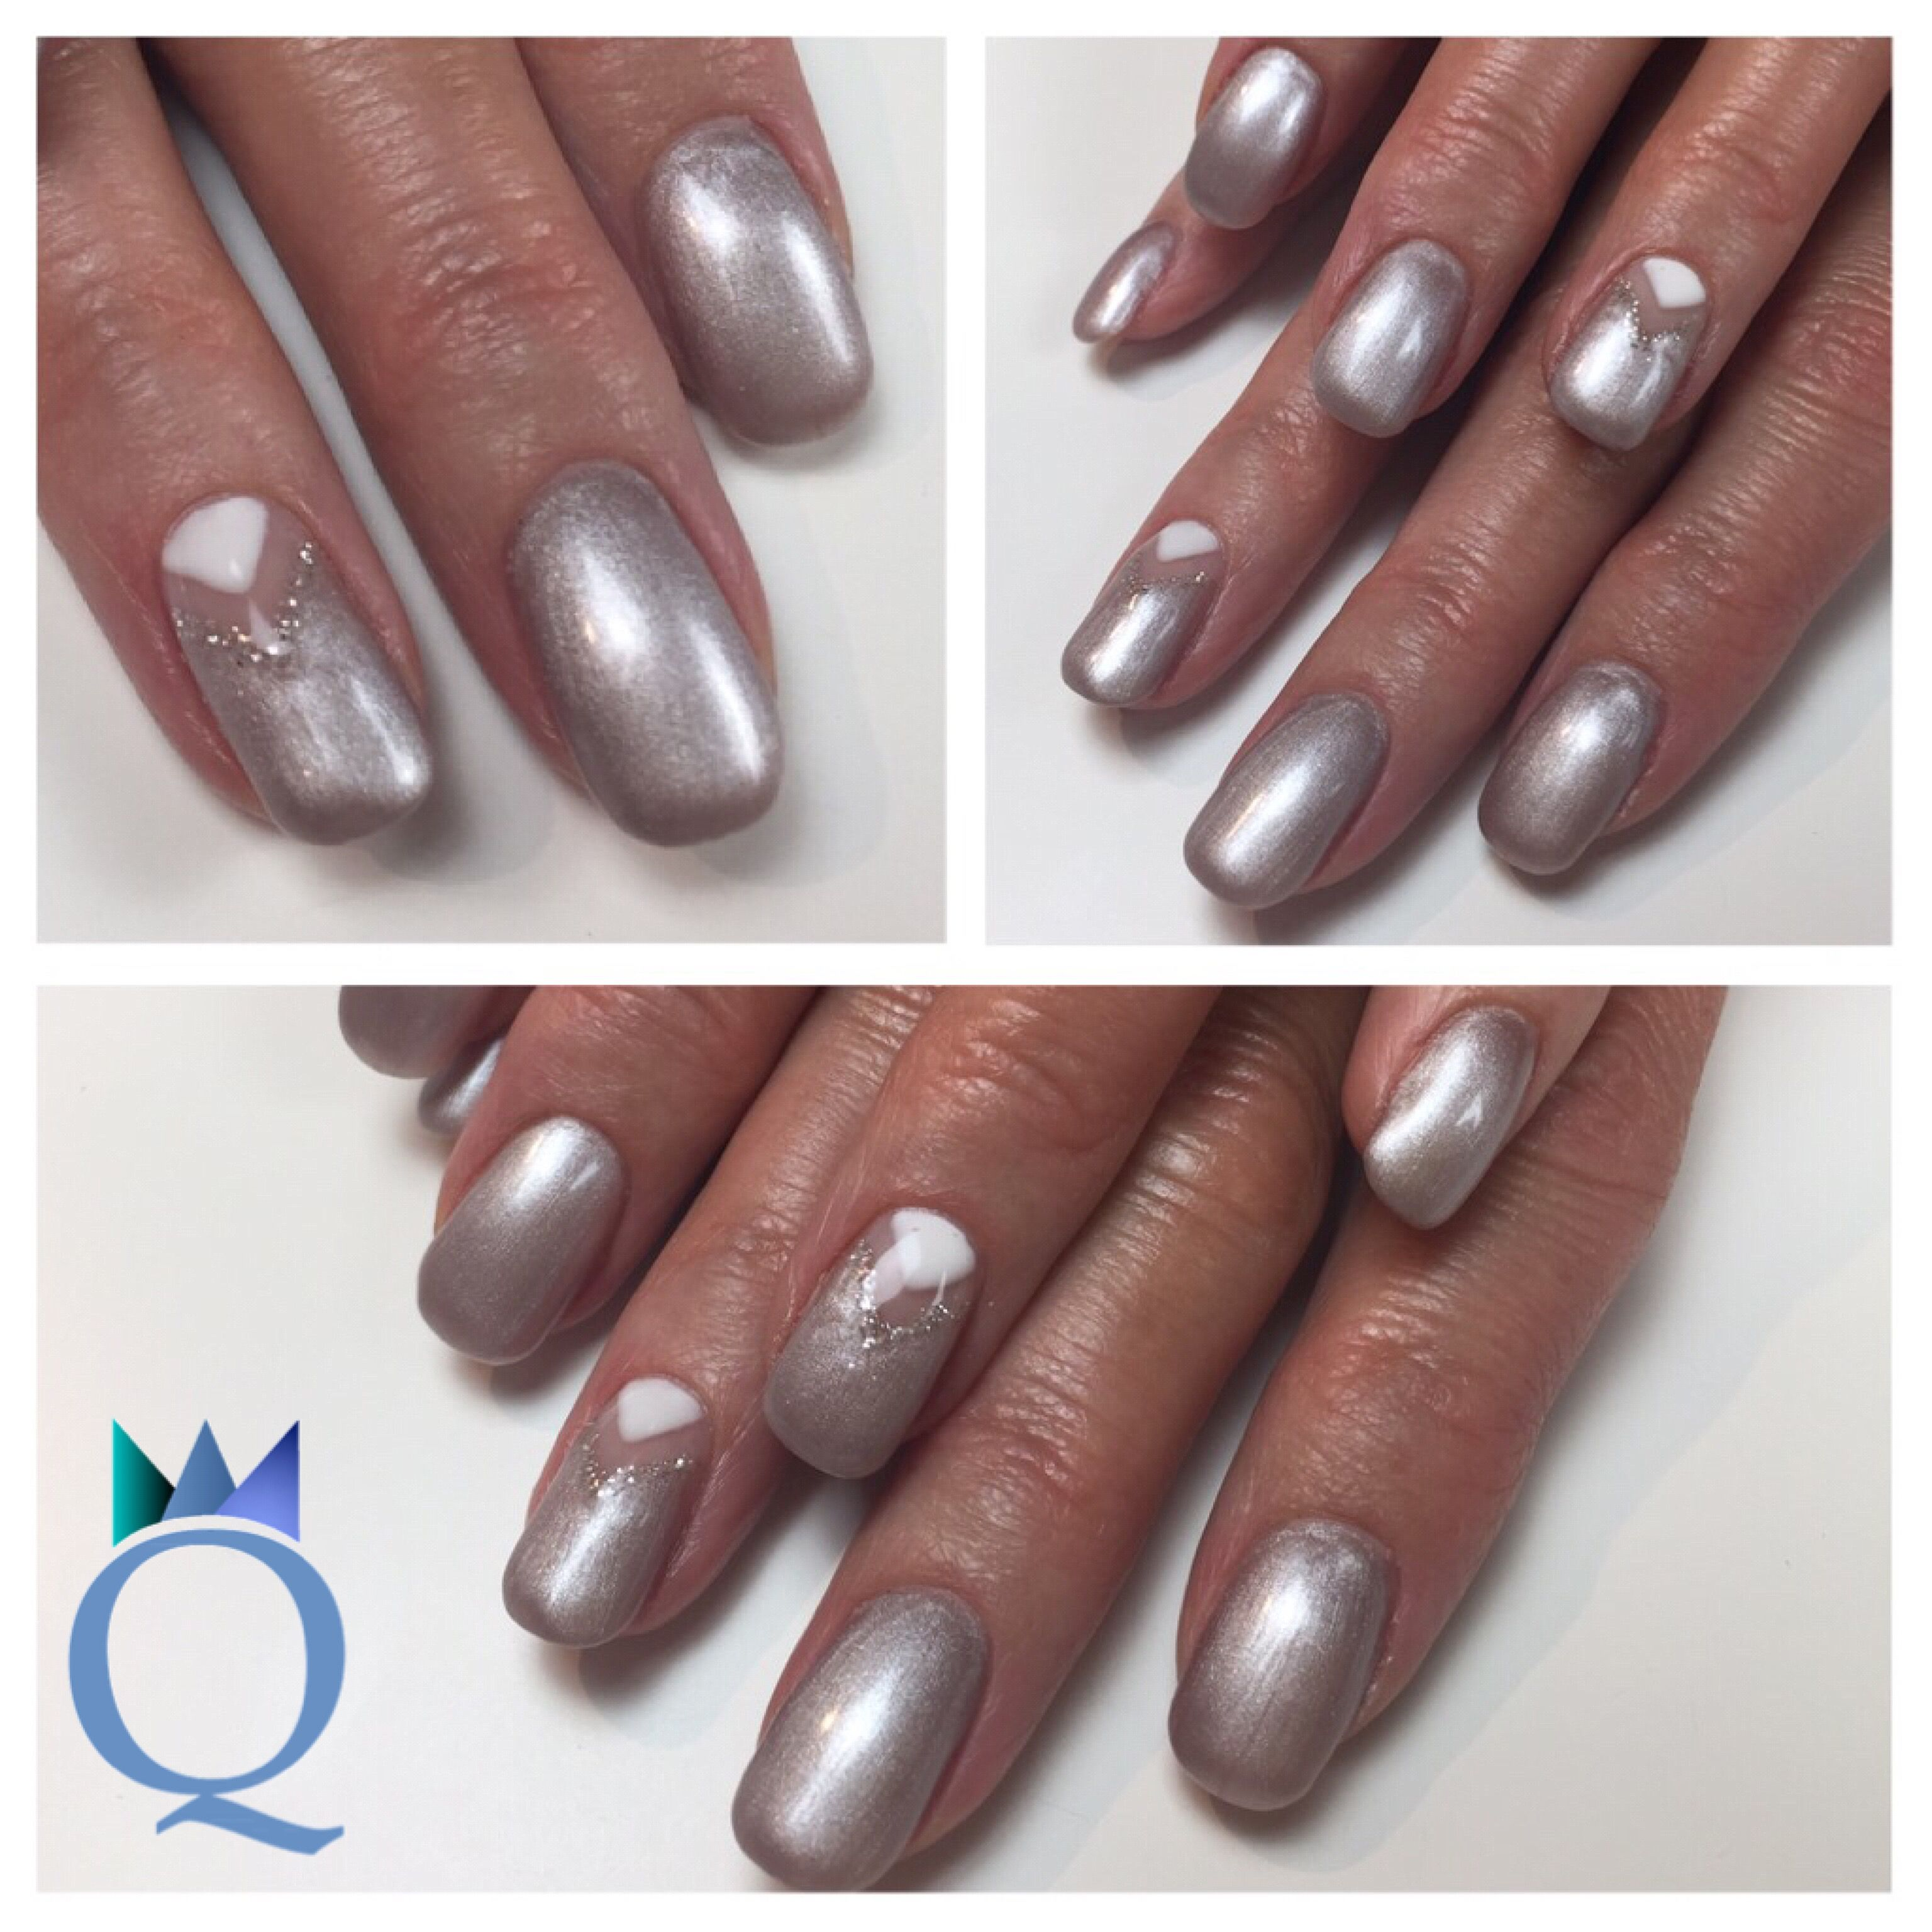 shortnails #gelnails #nails #silver #grey #white #triangle ...